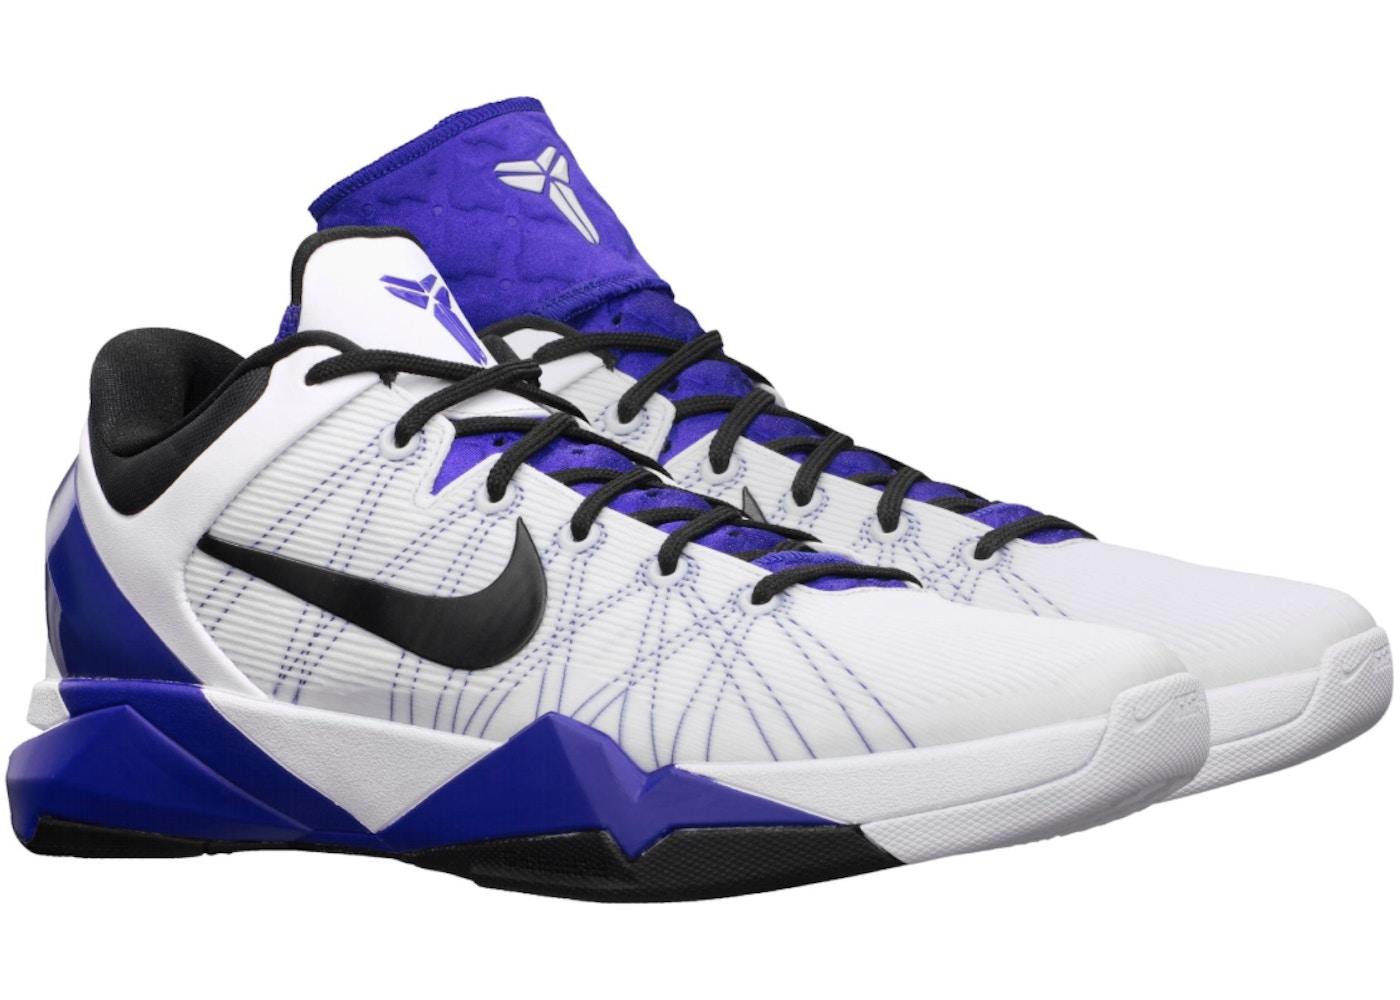 5fa5647db417 Buy Nike Kobe 7 Shoes   Deadstock Sneakers